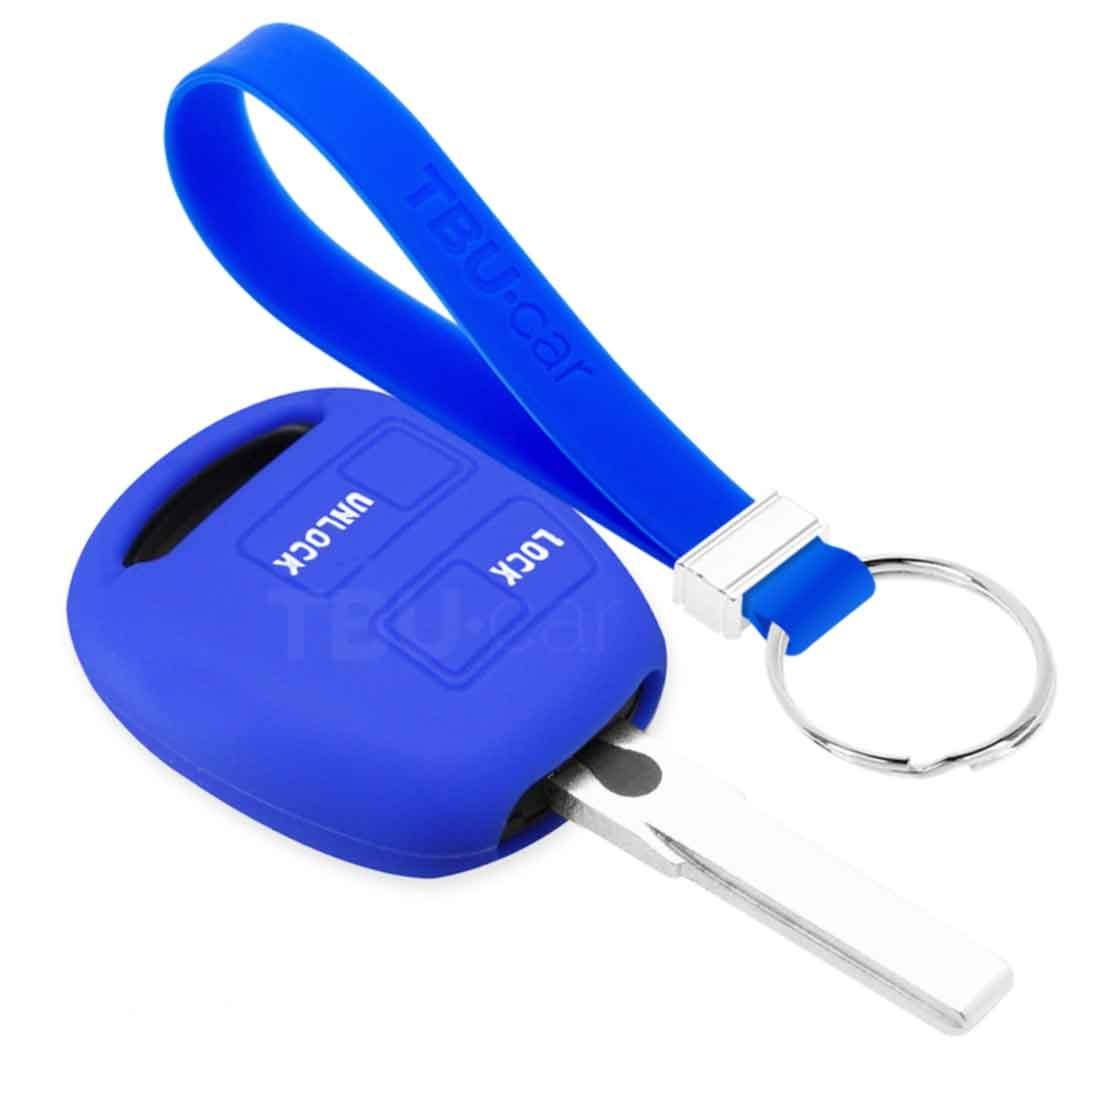 TBU car TBU car Sleutel cover compatibel met Lexus - Silicone sleutelhoesje - beschermhoesje autosleutel - Blauw